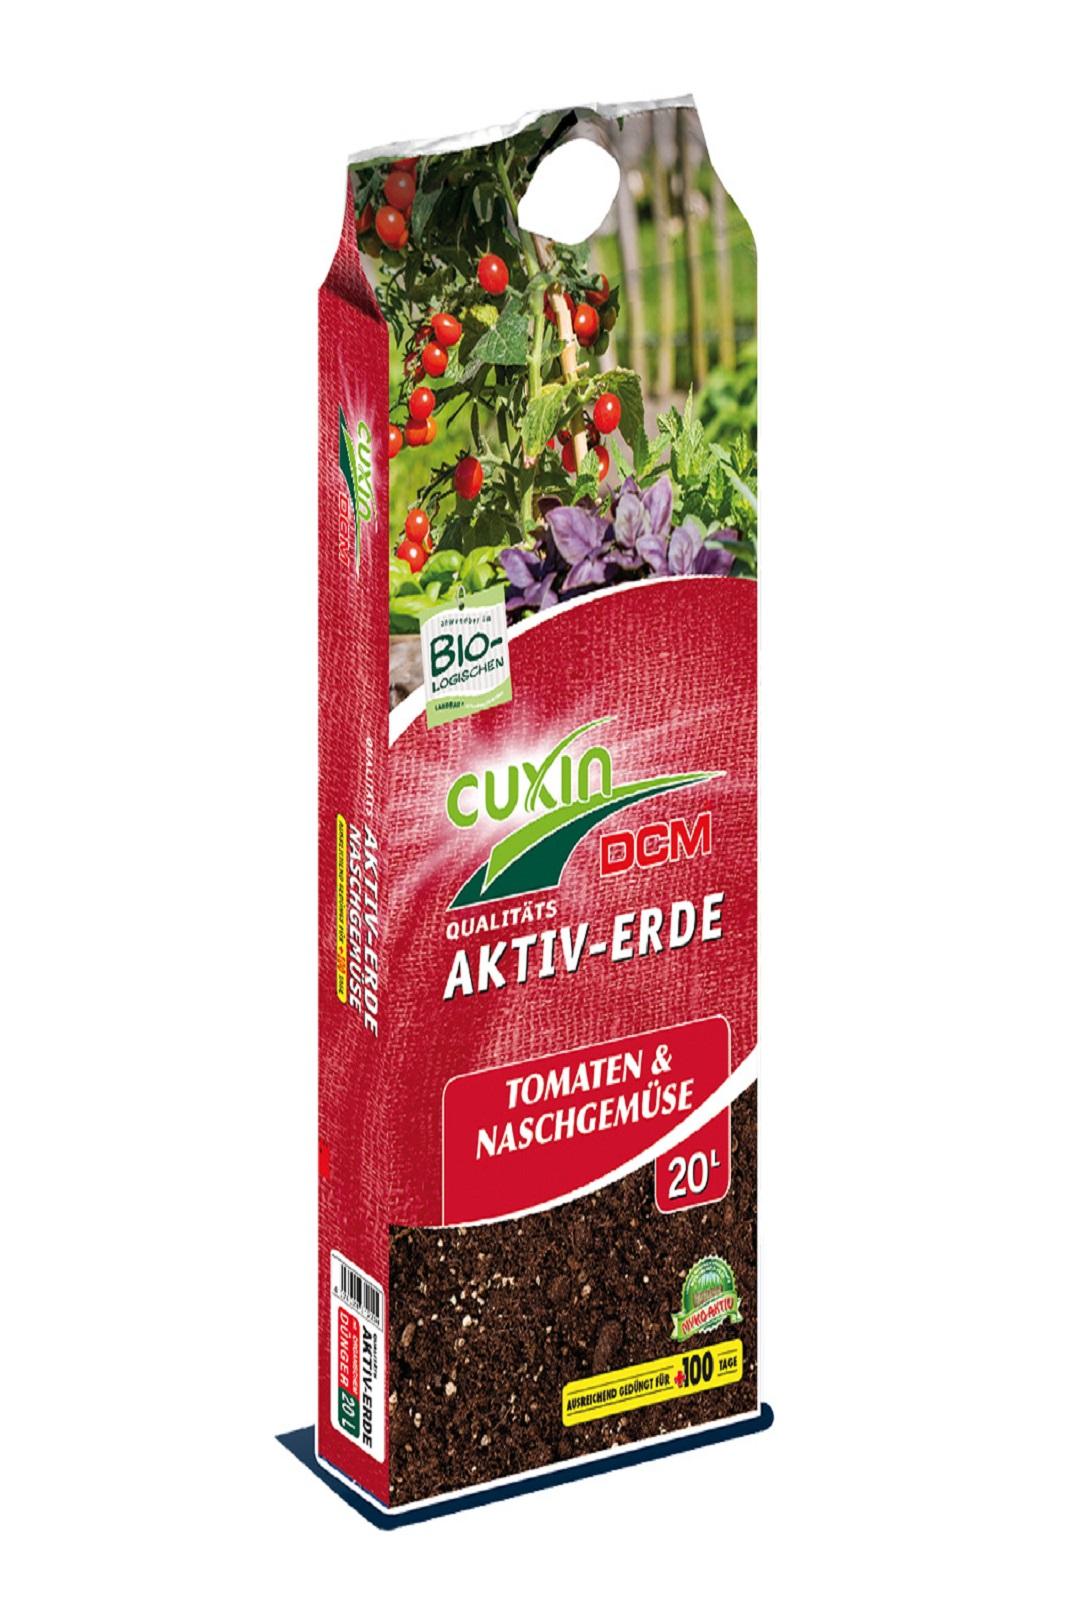 Cuxin DCM Aktiv Erde Tomaten und Naschgemüse Gemüseerde  20 l